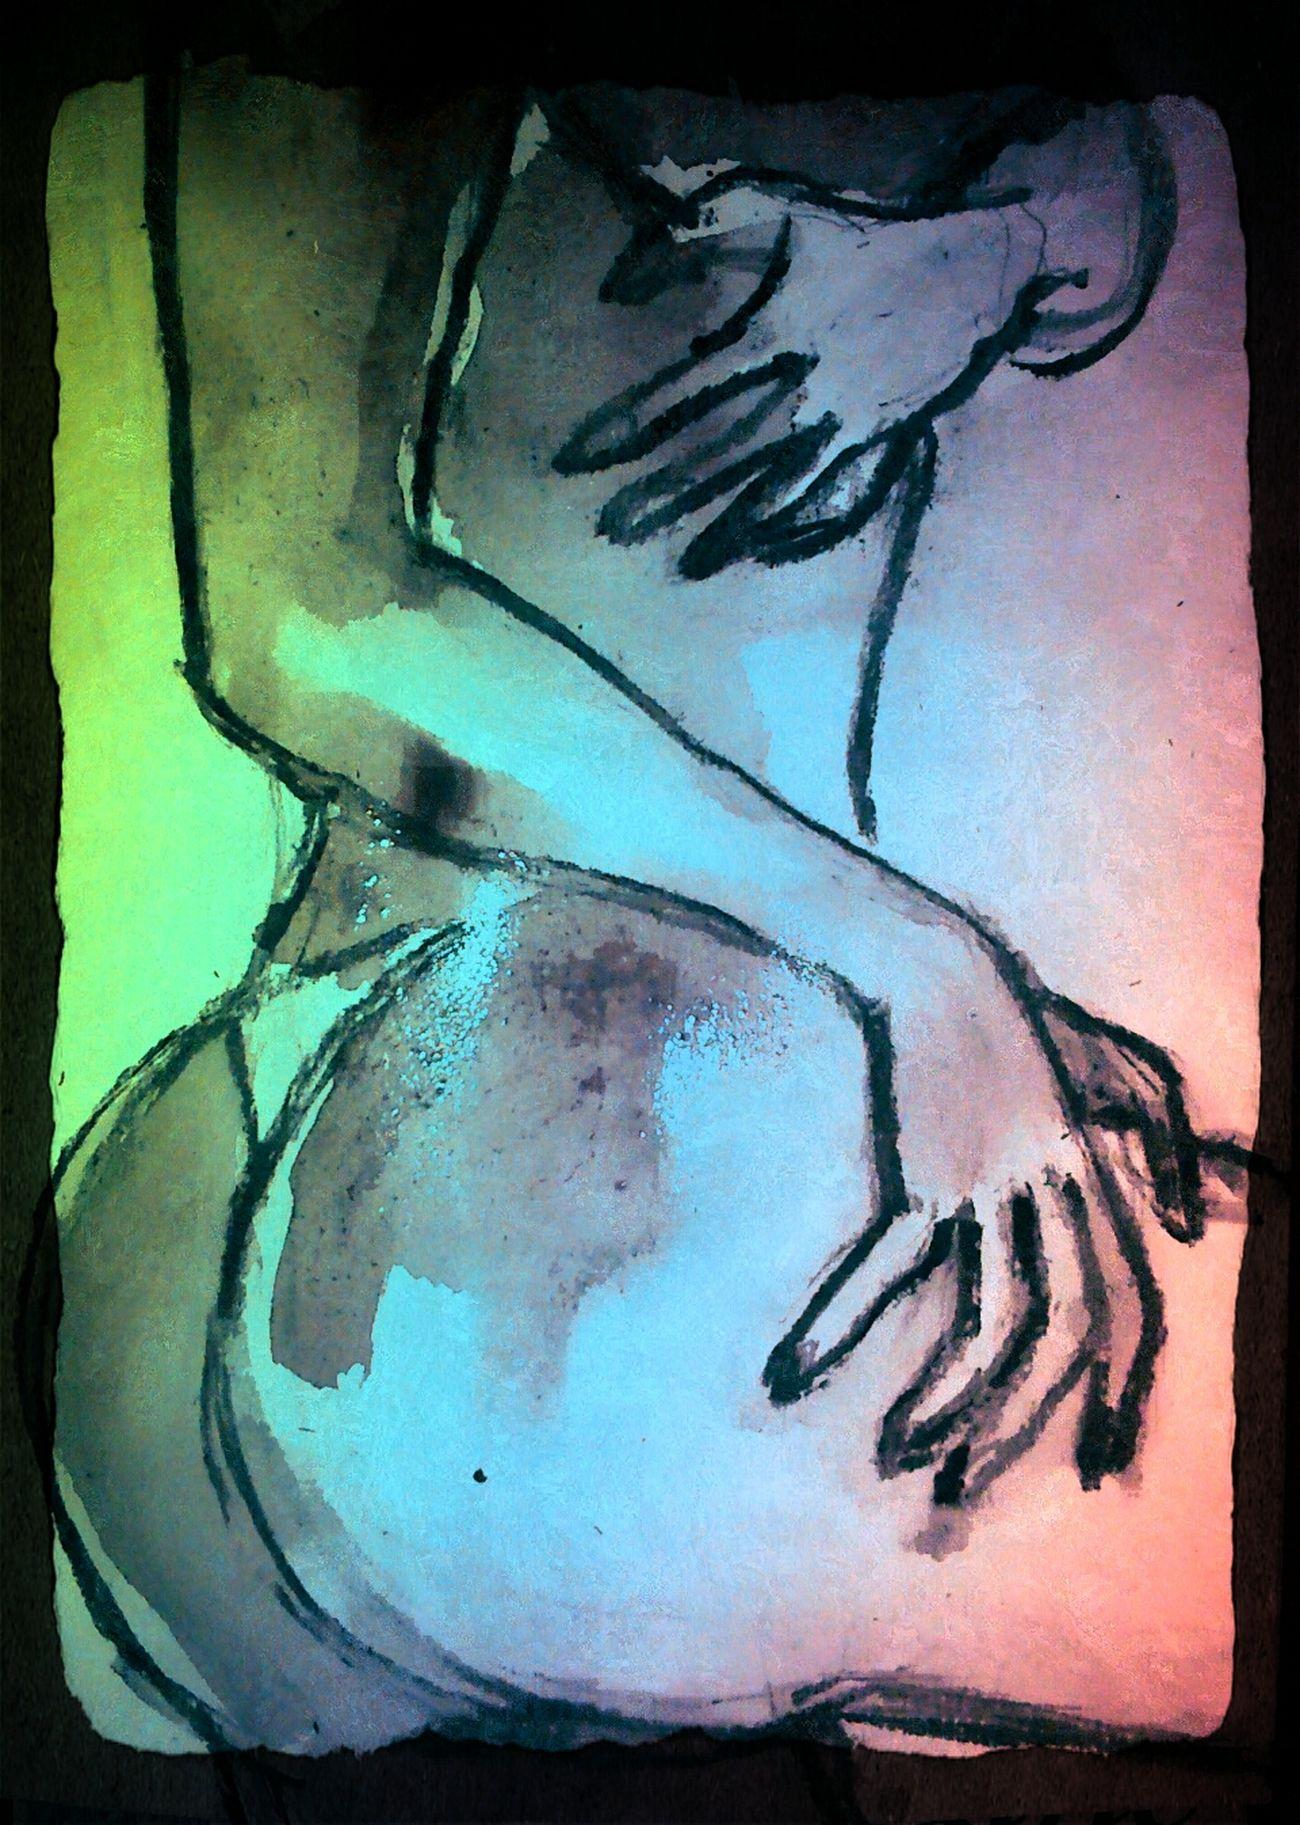 Textured  Watercolor Painting Human Body Part Beautiful Woman Beauty Art And Craft Drawing - Activity Drawing - Art Product Creativity Human Representation Multi Colored